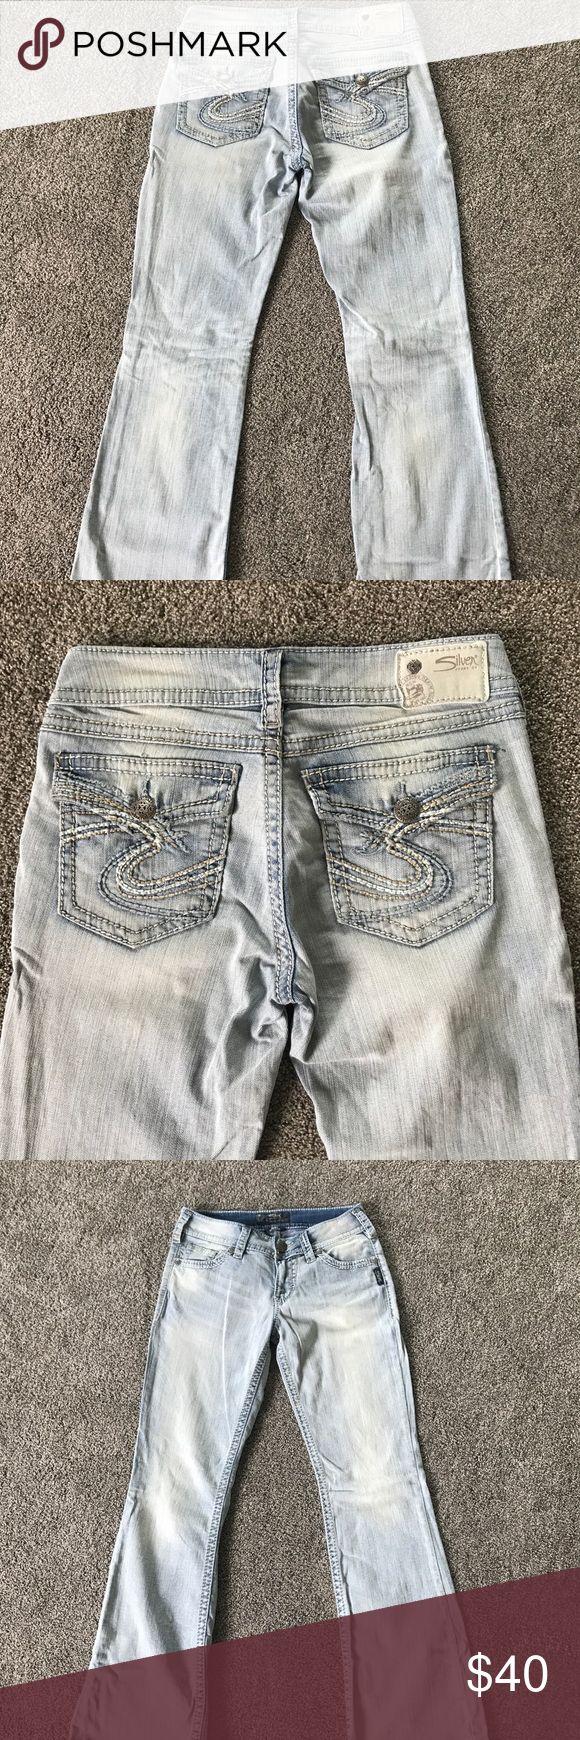 Women's Silver Suki jeans sz 27/30 Women's Suki Silver Jeans size 27/30 super cute! No flaws! Very comfortable! Silver Jeans Pants Boot Cut & Flare